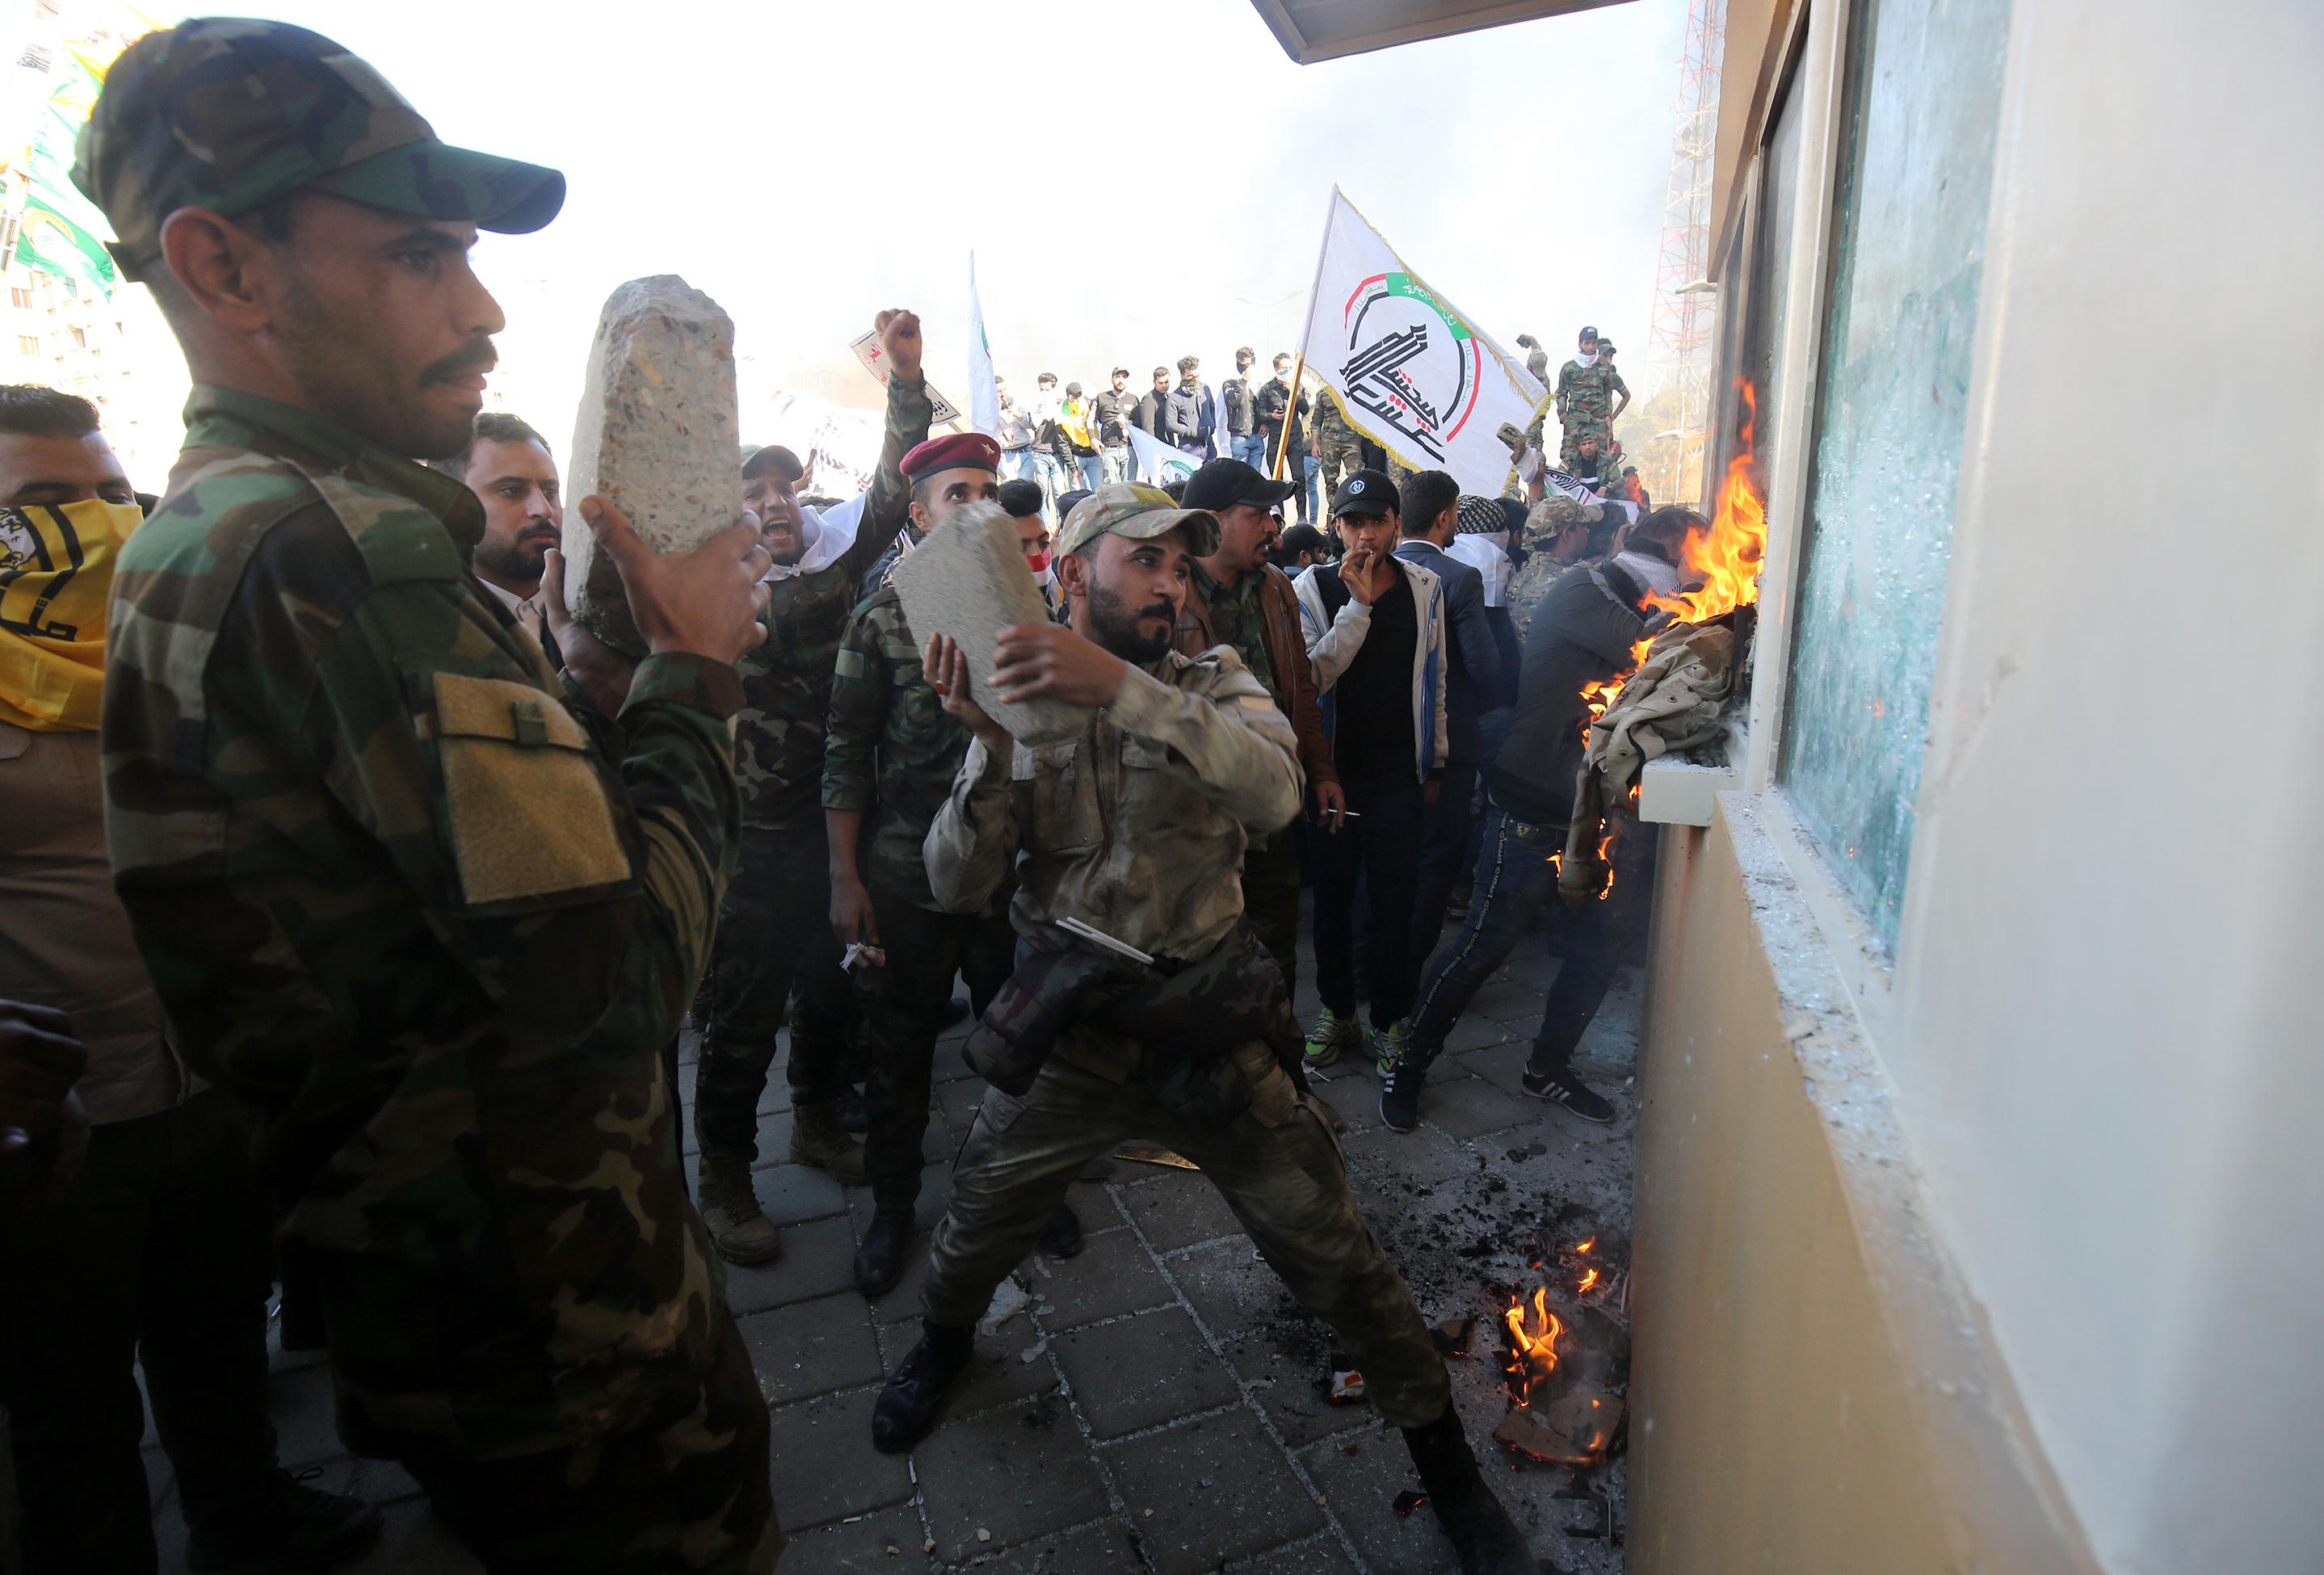 Members the Hashed al-Shaabi smash embassay